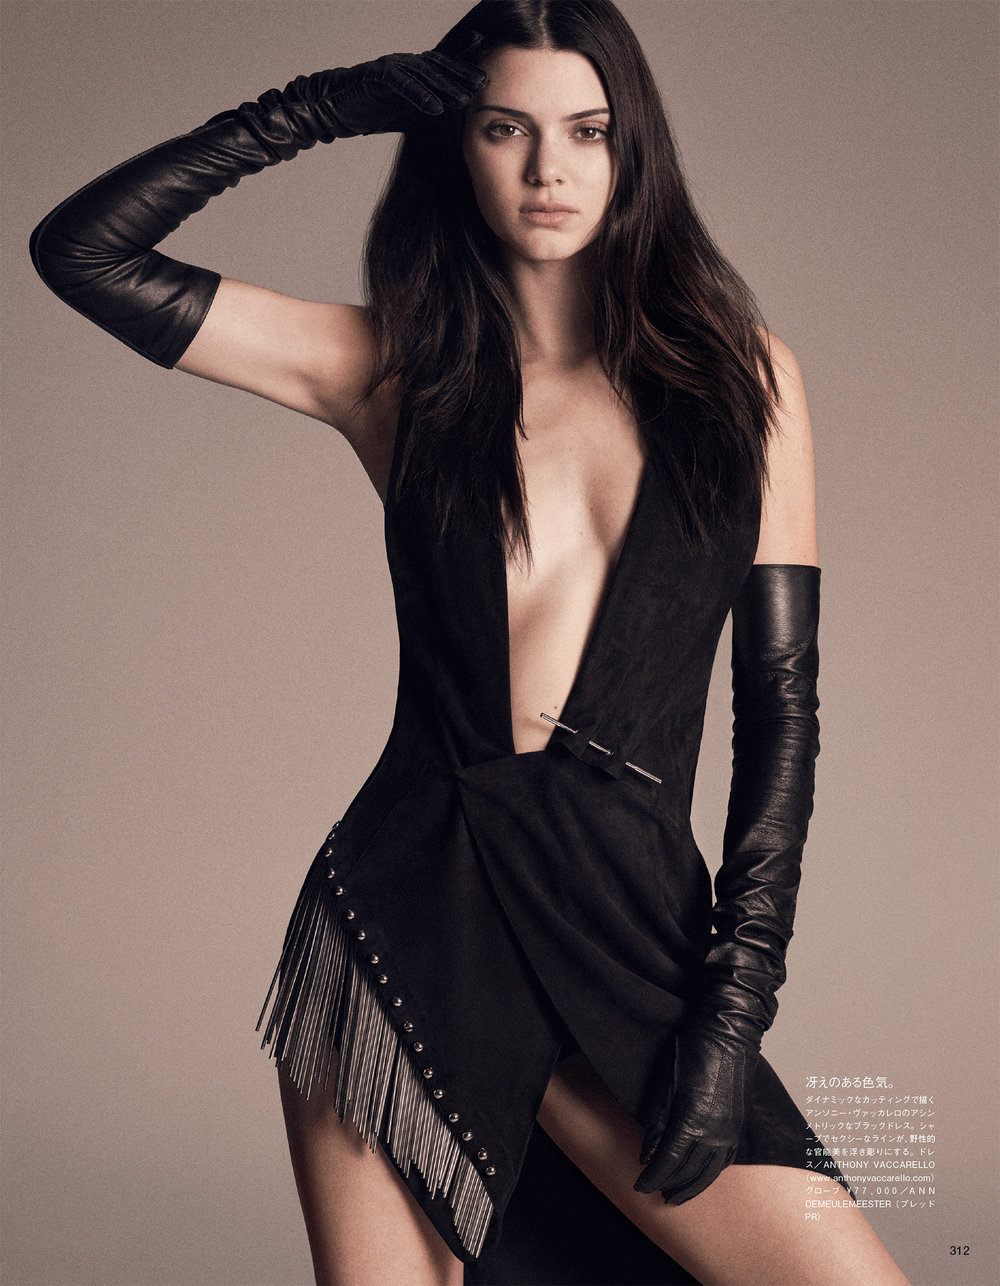 Giovanna-Battaglia-Vogue-Japan-November-2015-Cool-As-Kendall-Patrick-Demarchelier-Kendall-Jenner-8.jpg